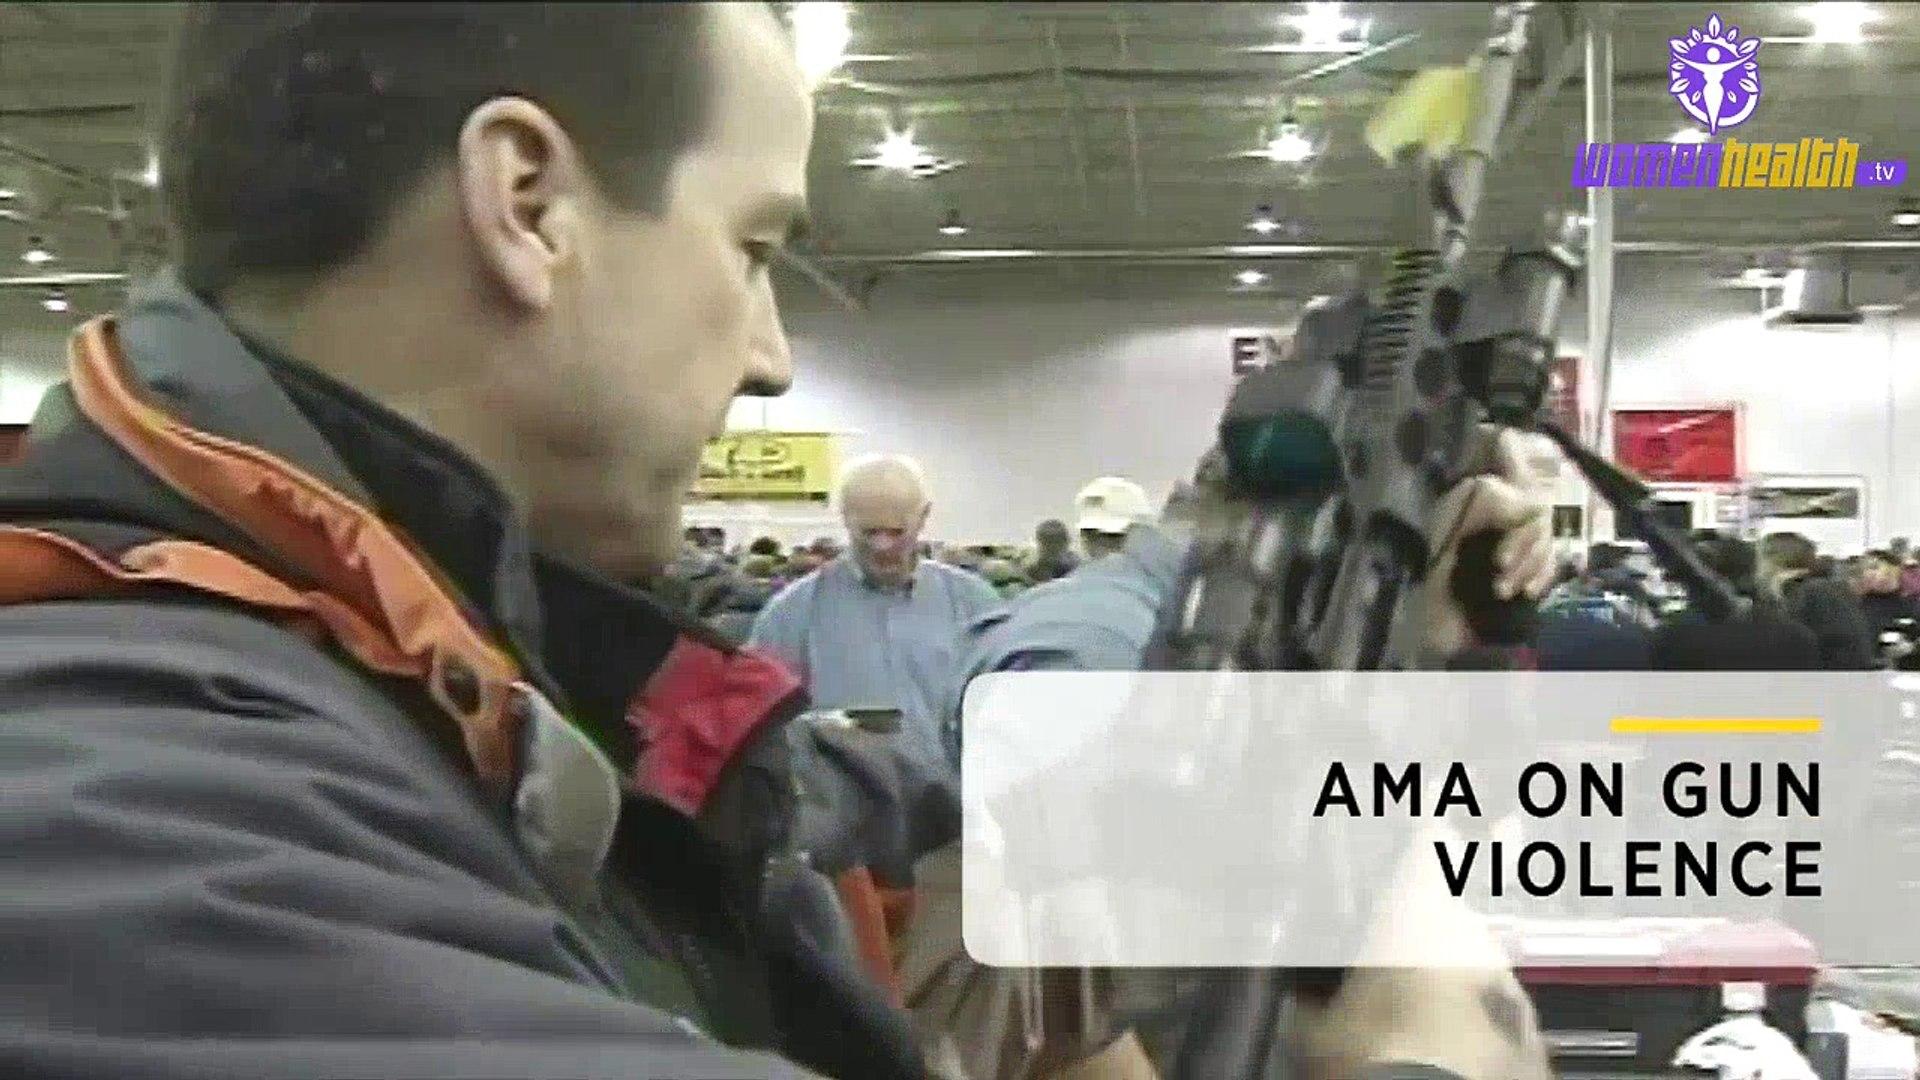 Doctors Calling Gun Violence A 'Very Public Health Crisis': Bottom Line | CNBC